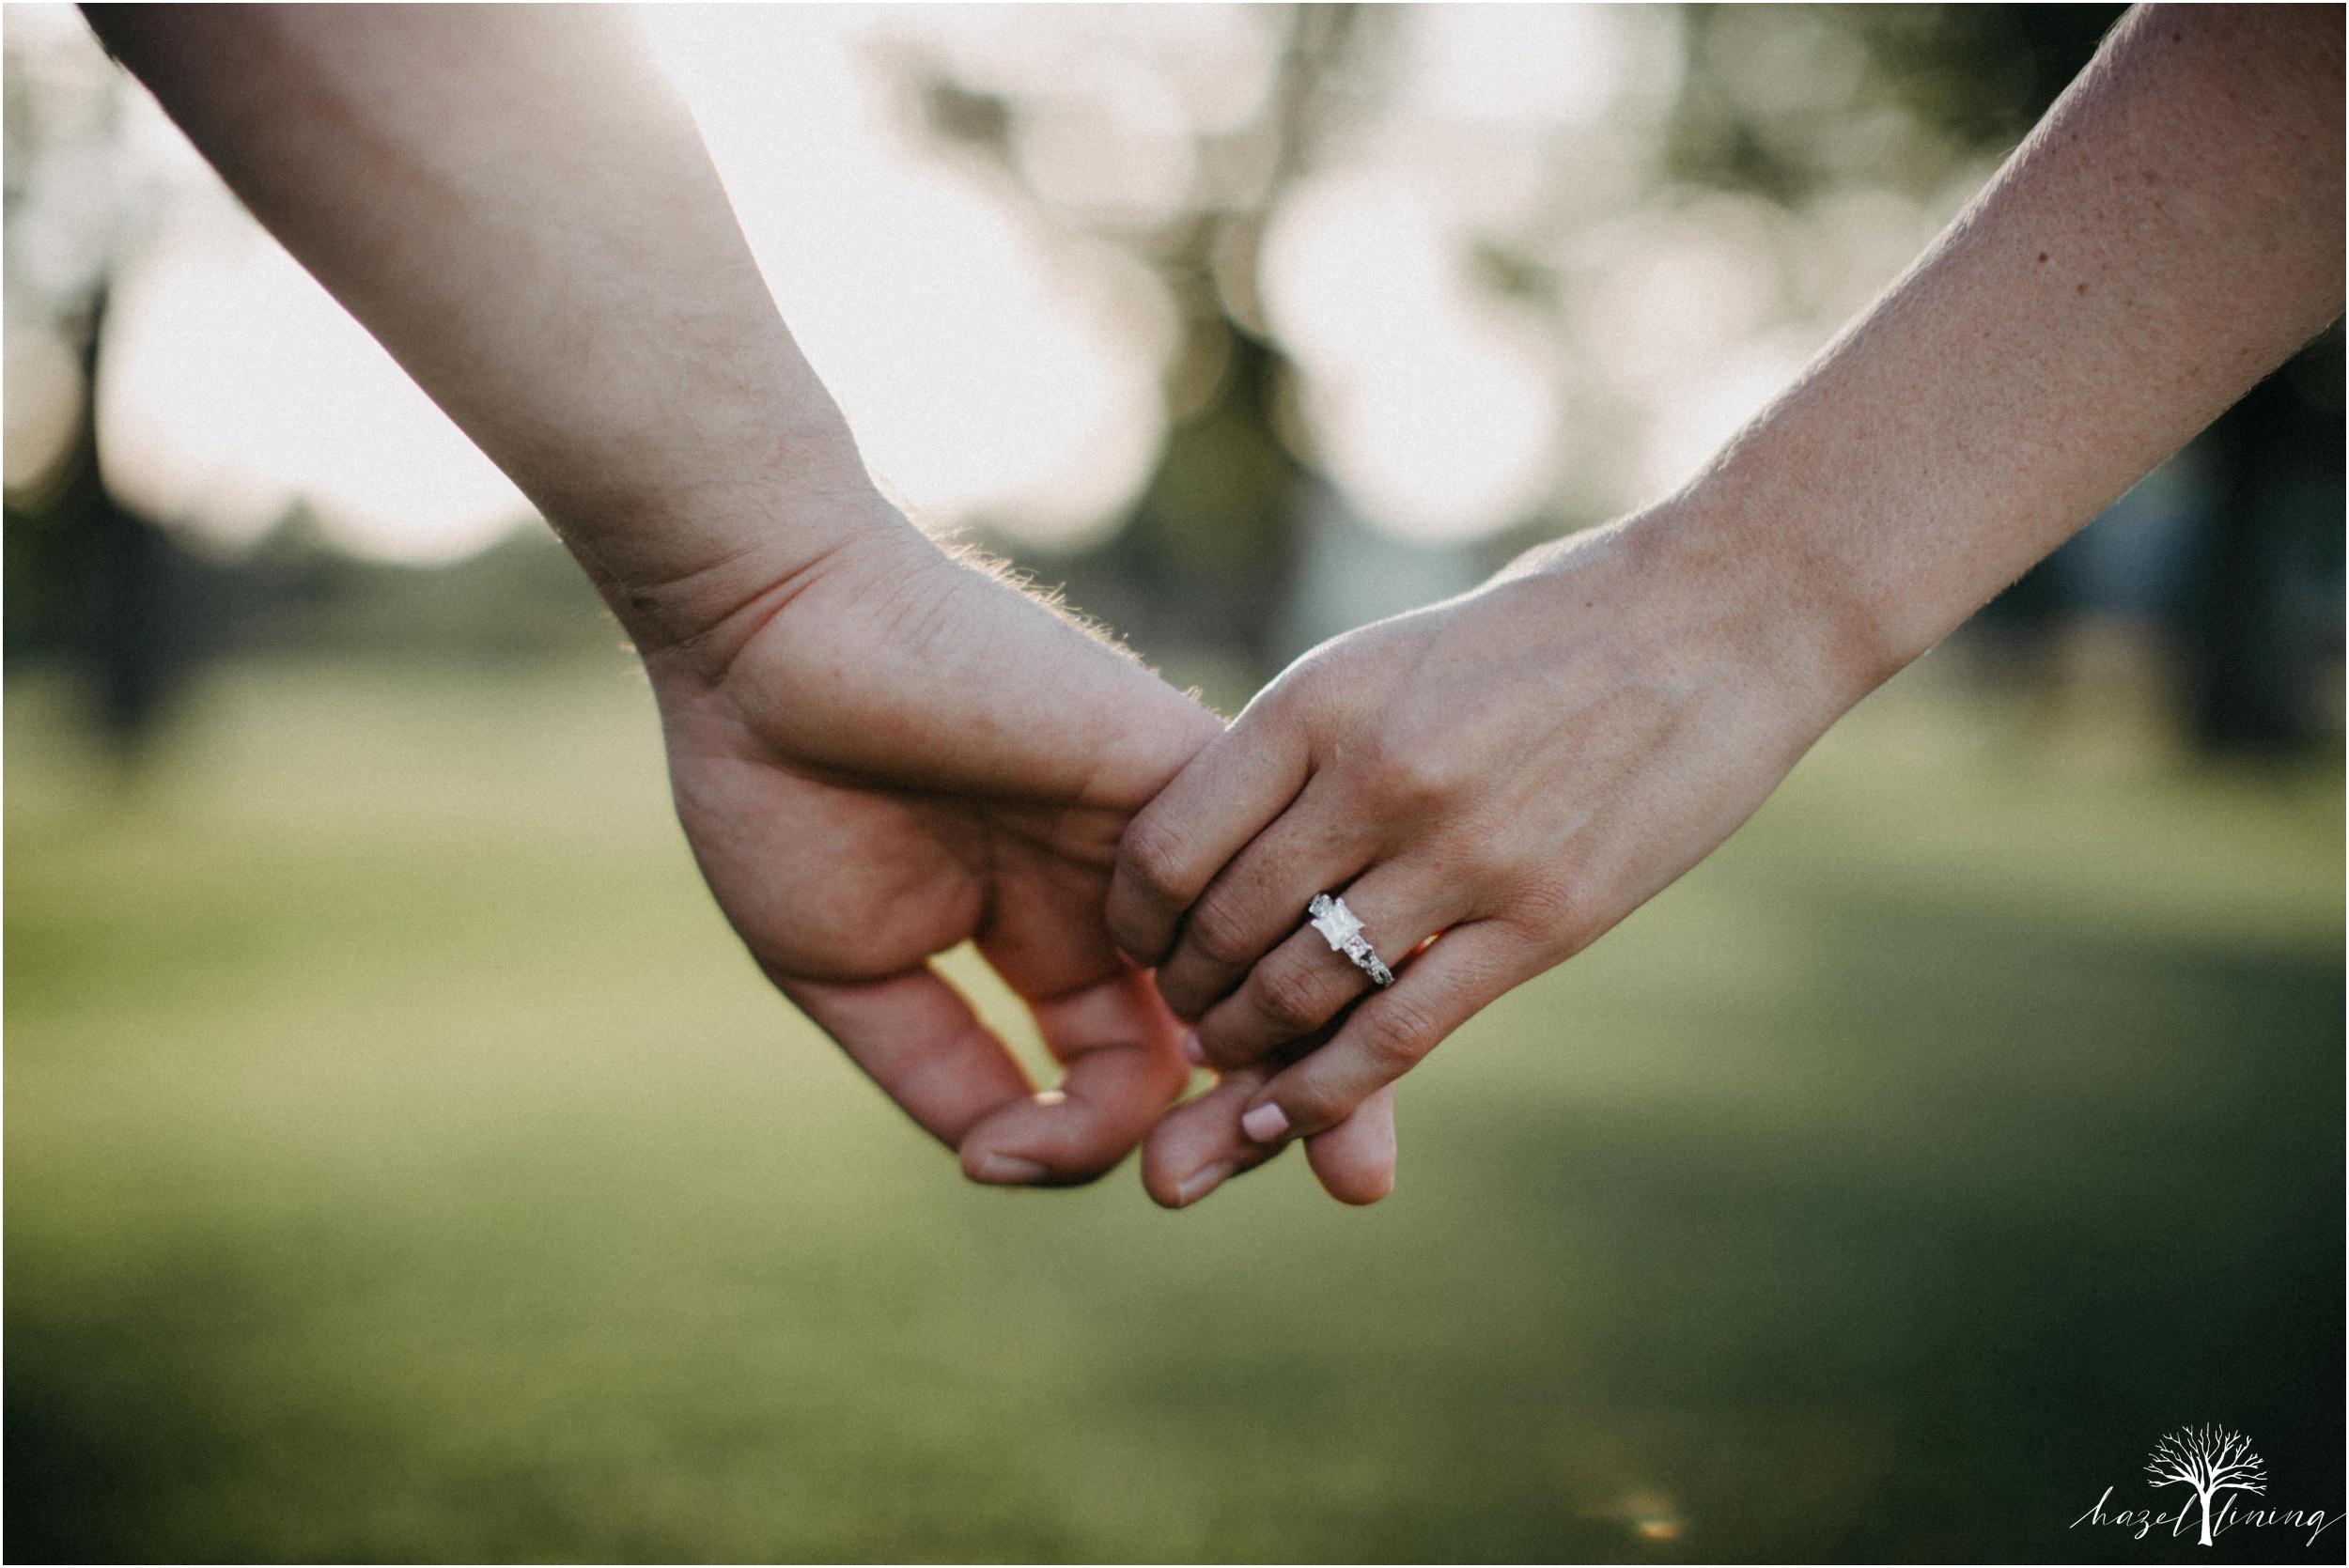 rachel-warner-chris-niedrist-the-farm-bakery-and-events-quakertown-pa-summer-engagement-hazel-lining-photography-destination-elopement-wedding-engagement-photography_0022.jpg